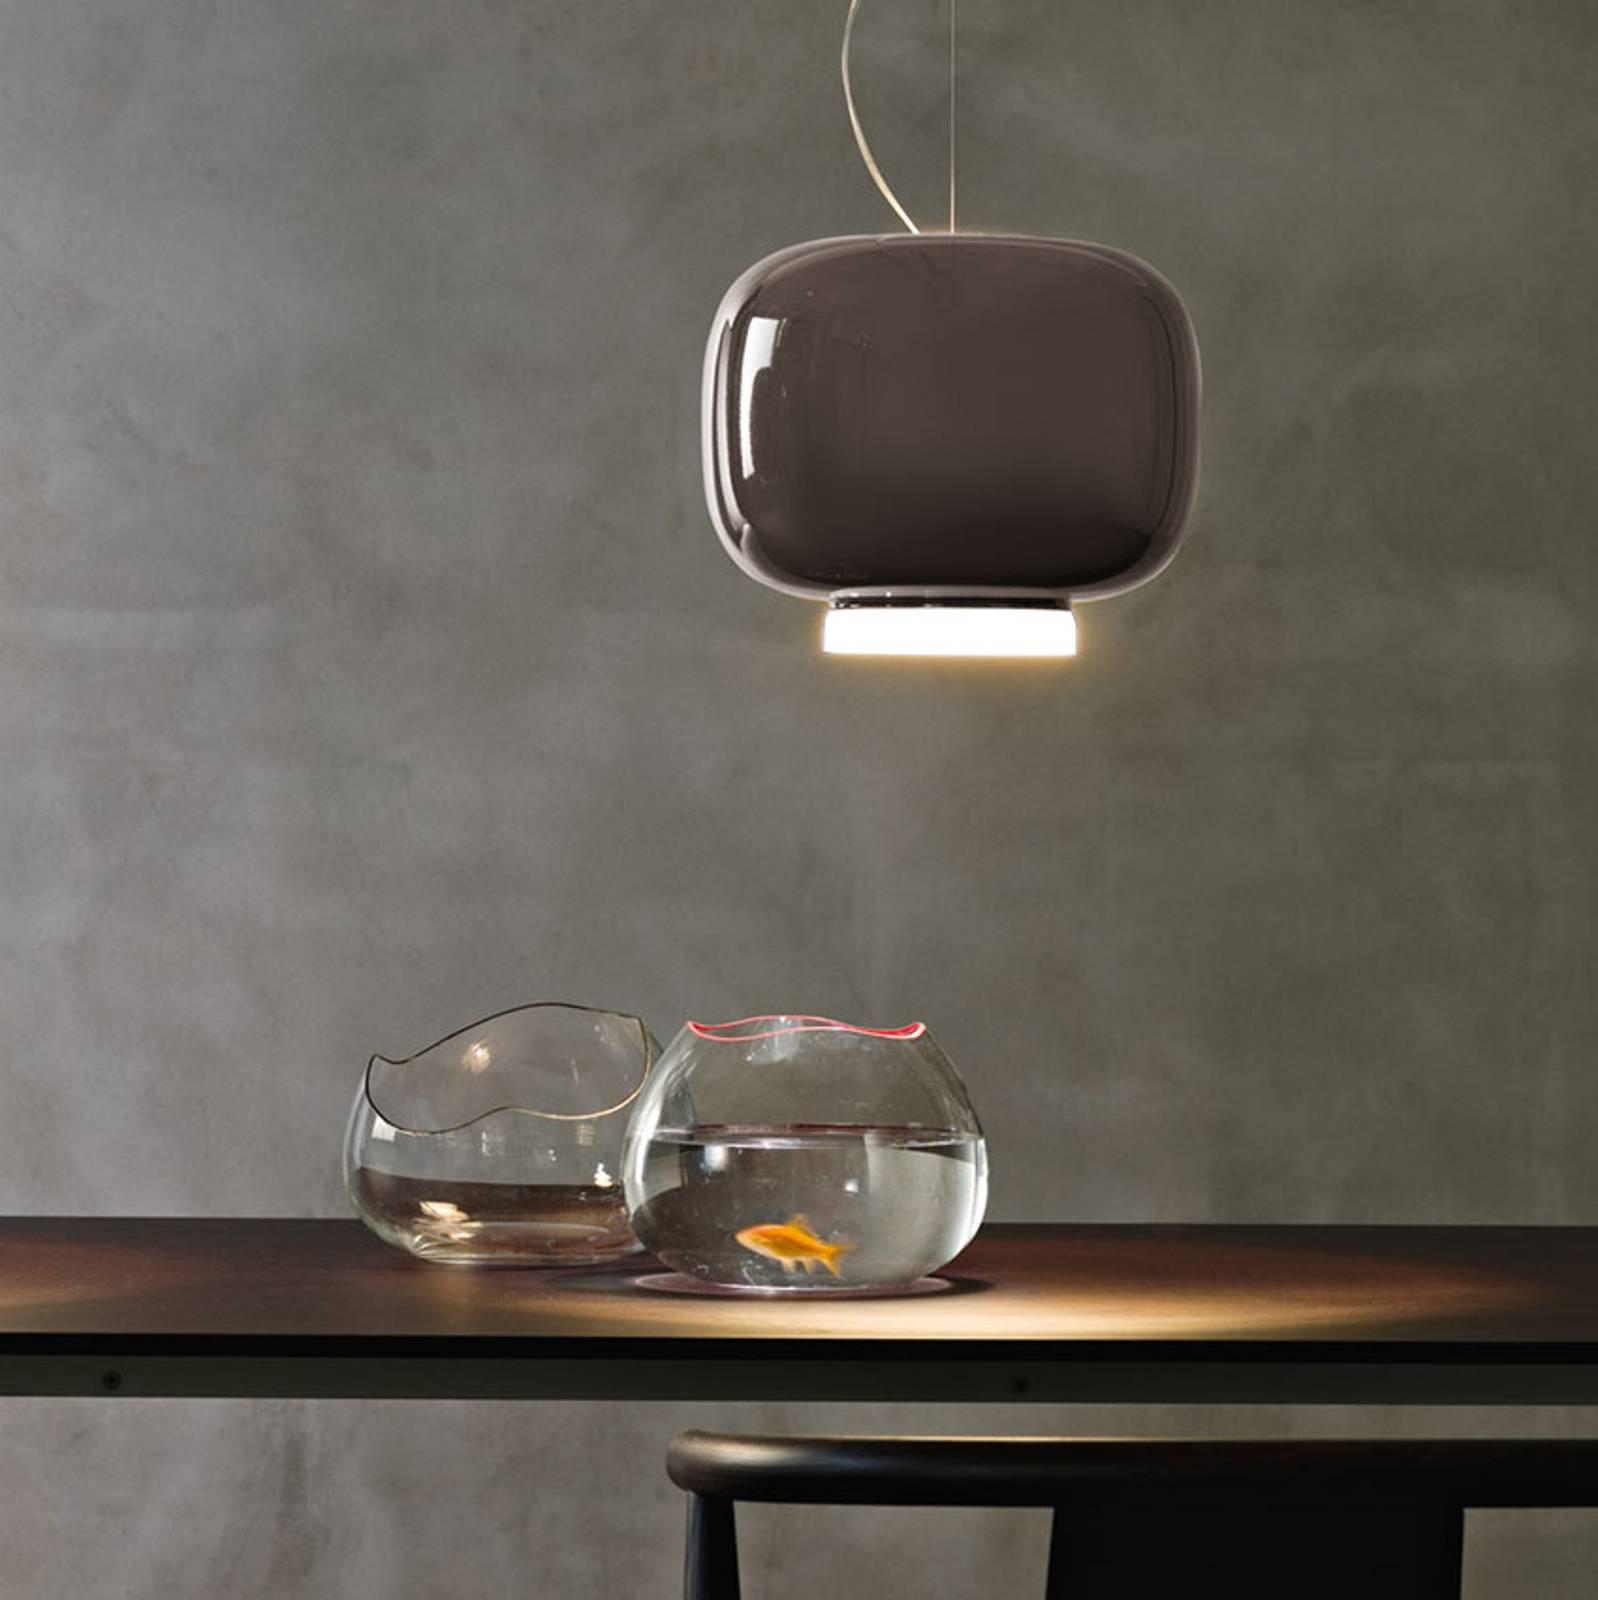 Foscarini Chouchin 3 LED-Hängeleuchte, grau